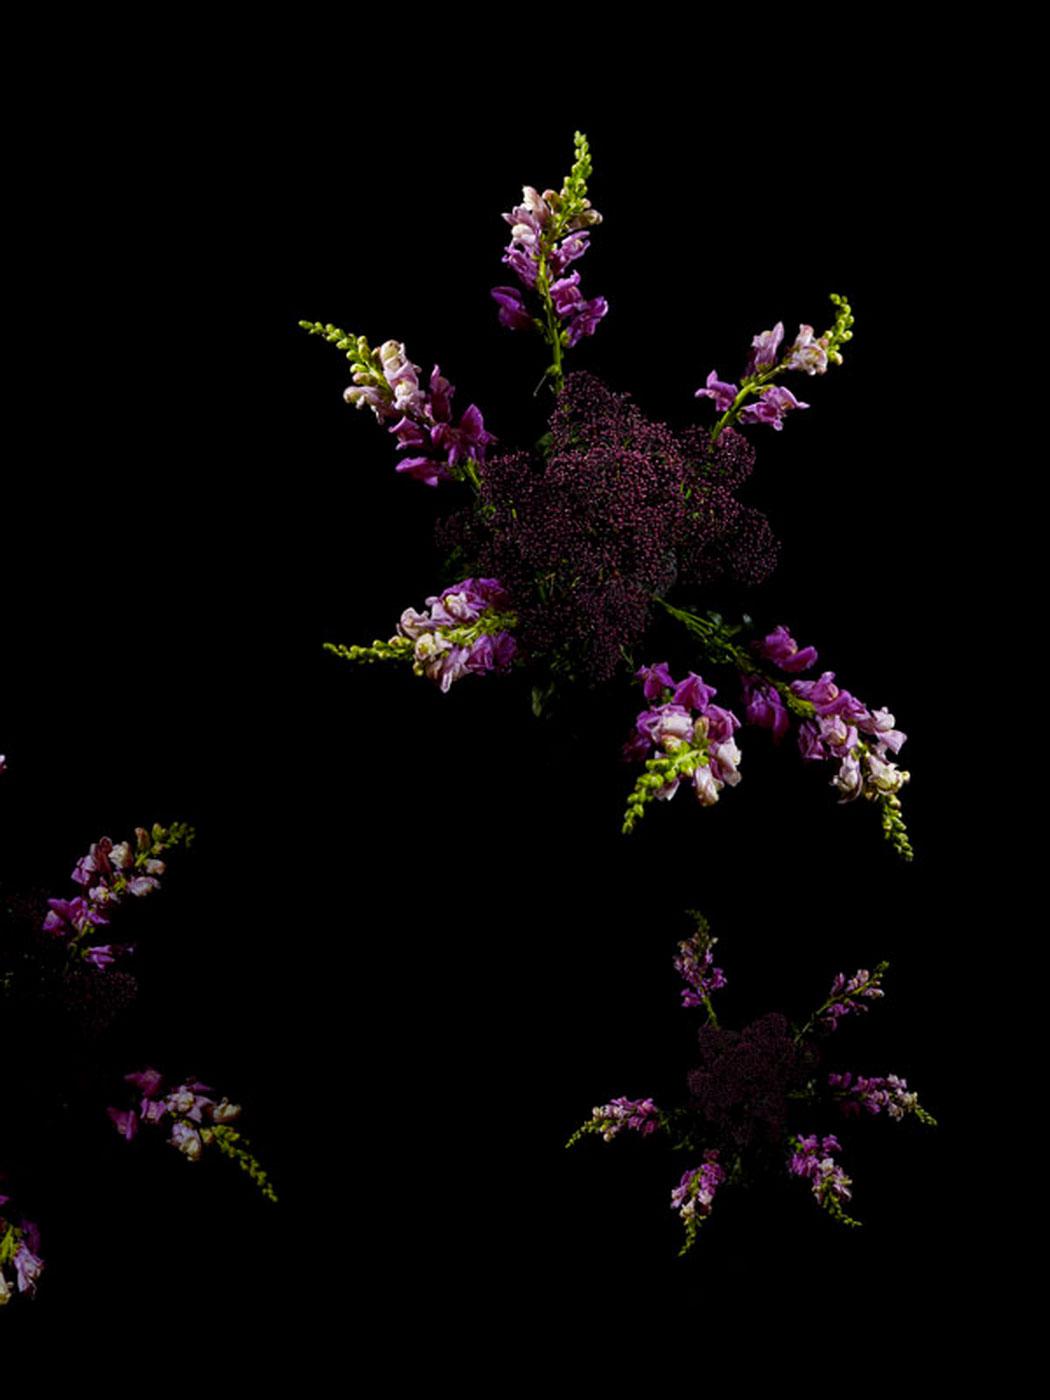 sarah-illenberger-flowerwork-07.jpg